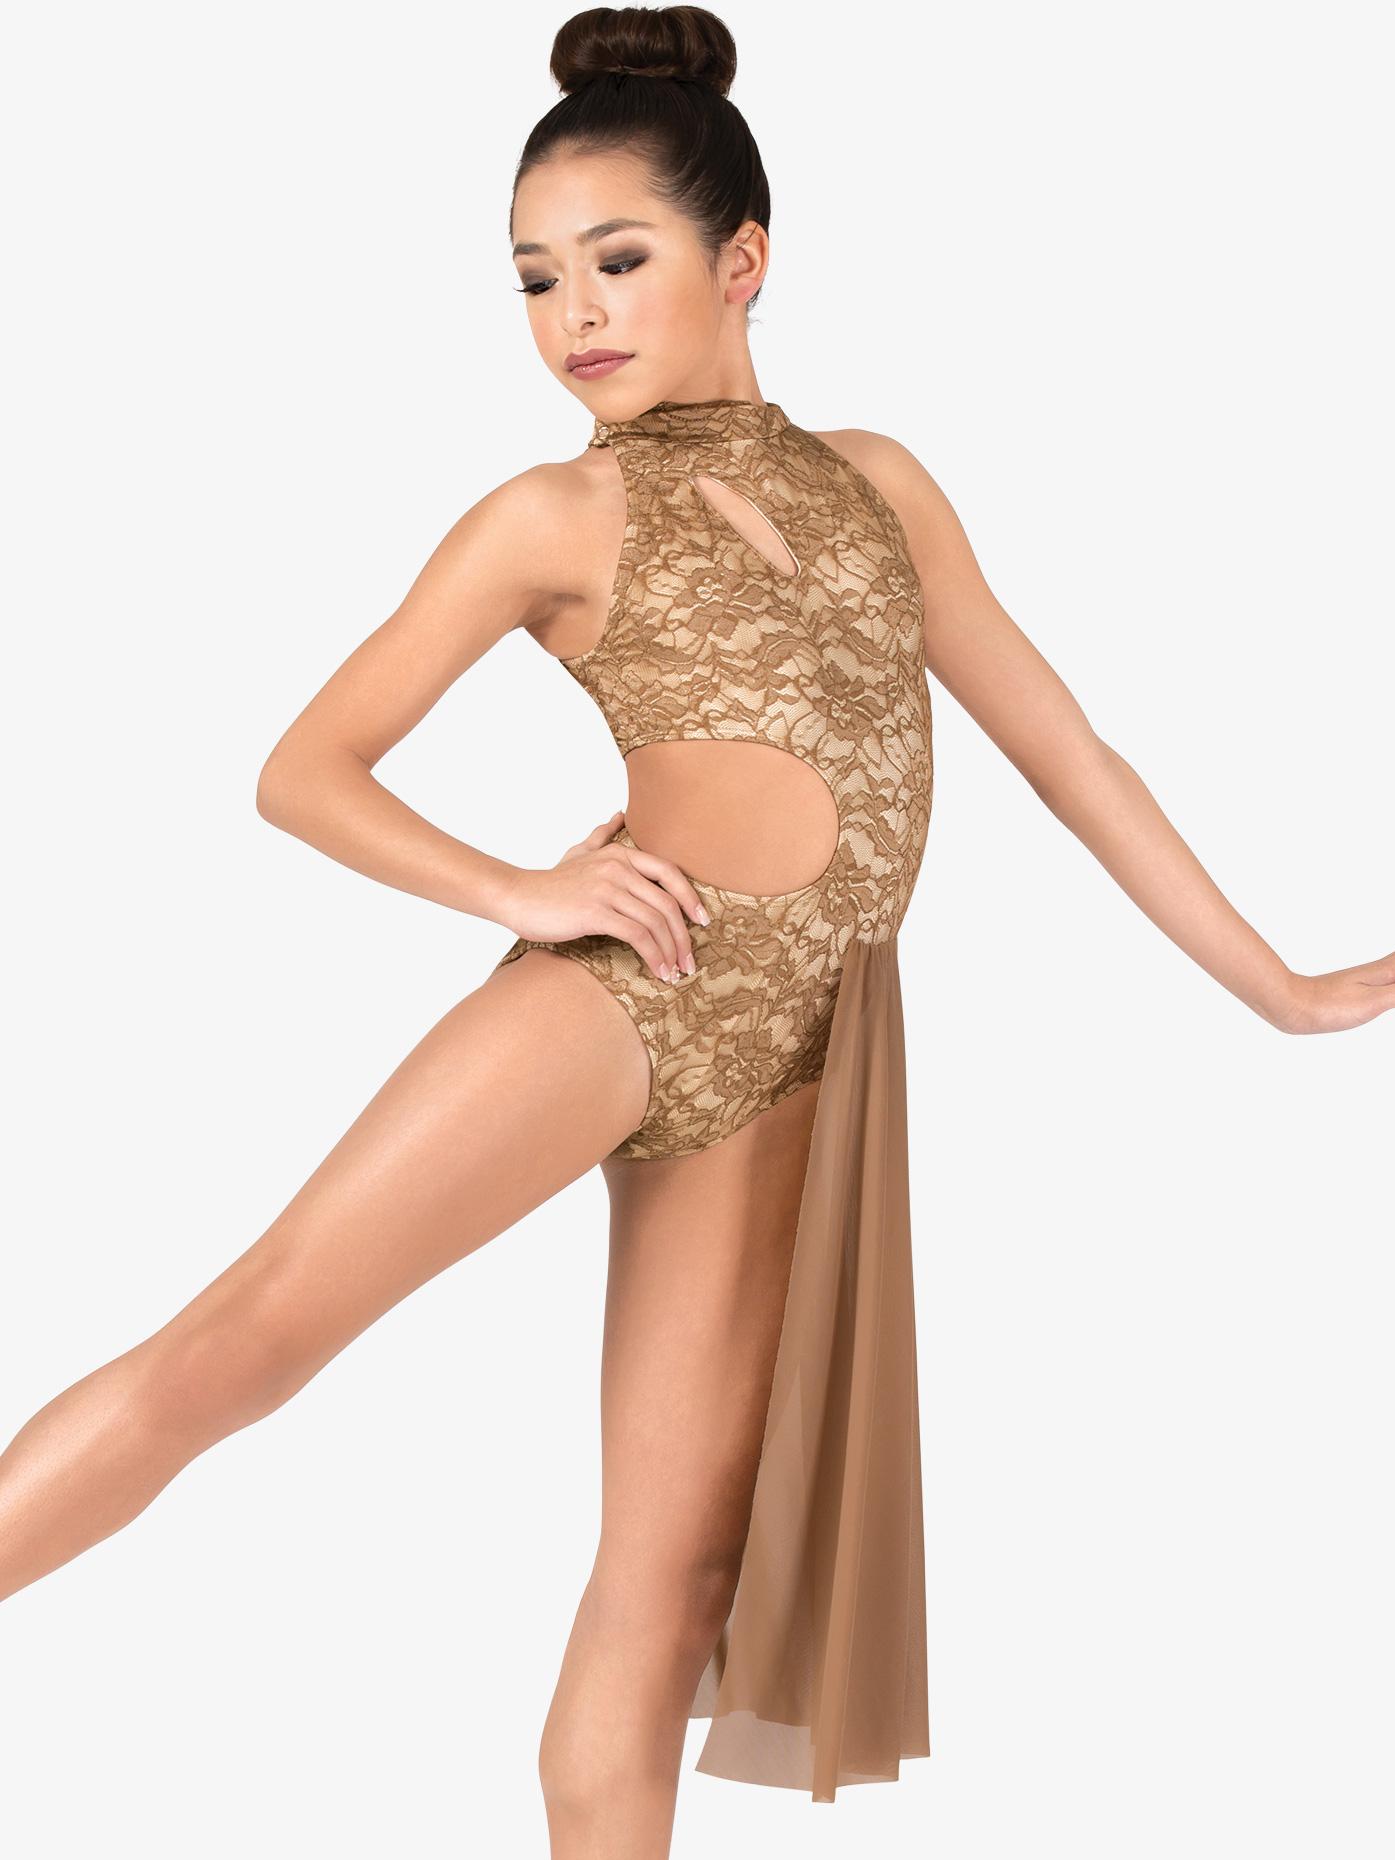 Double Platinum Girls Performance Lace Mock Neck Asymmetrical Dress N7561C